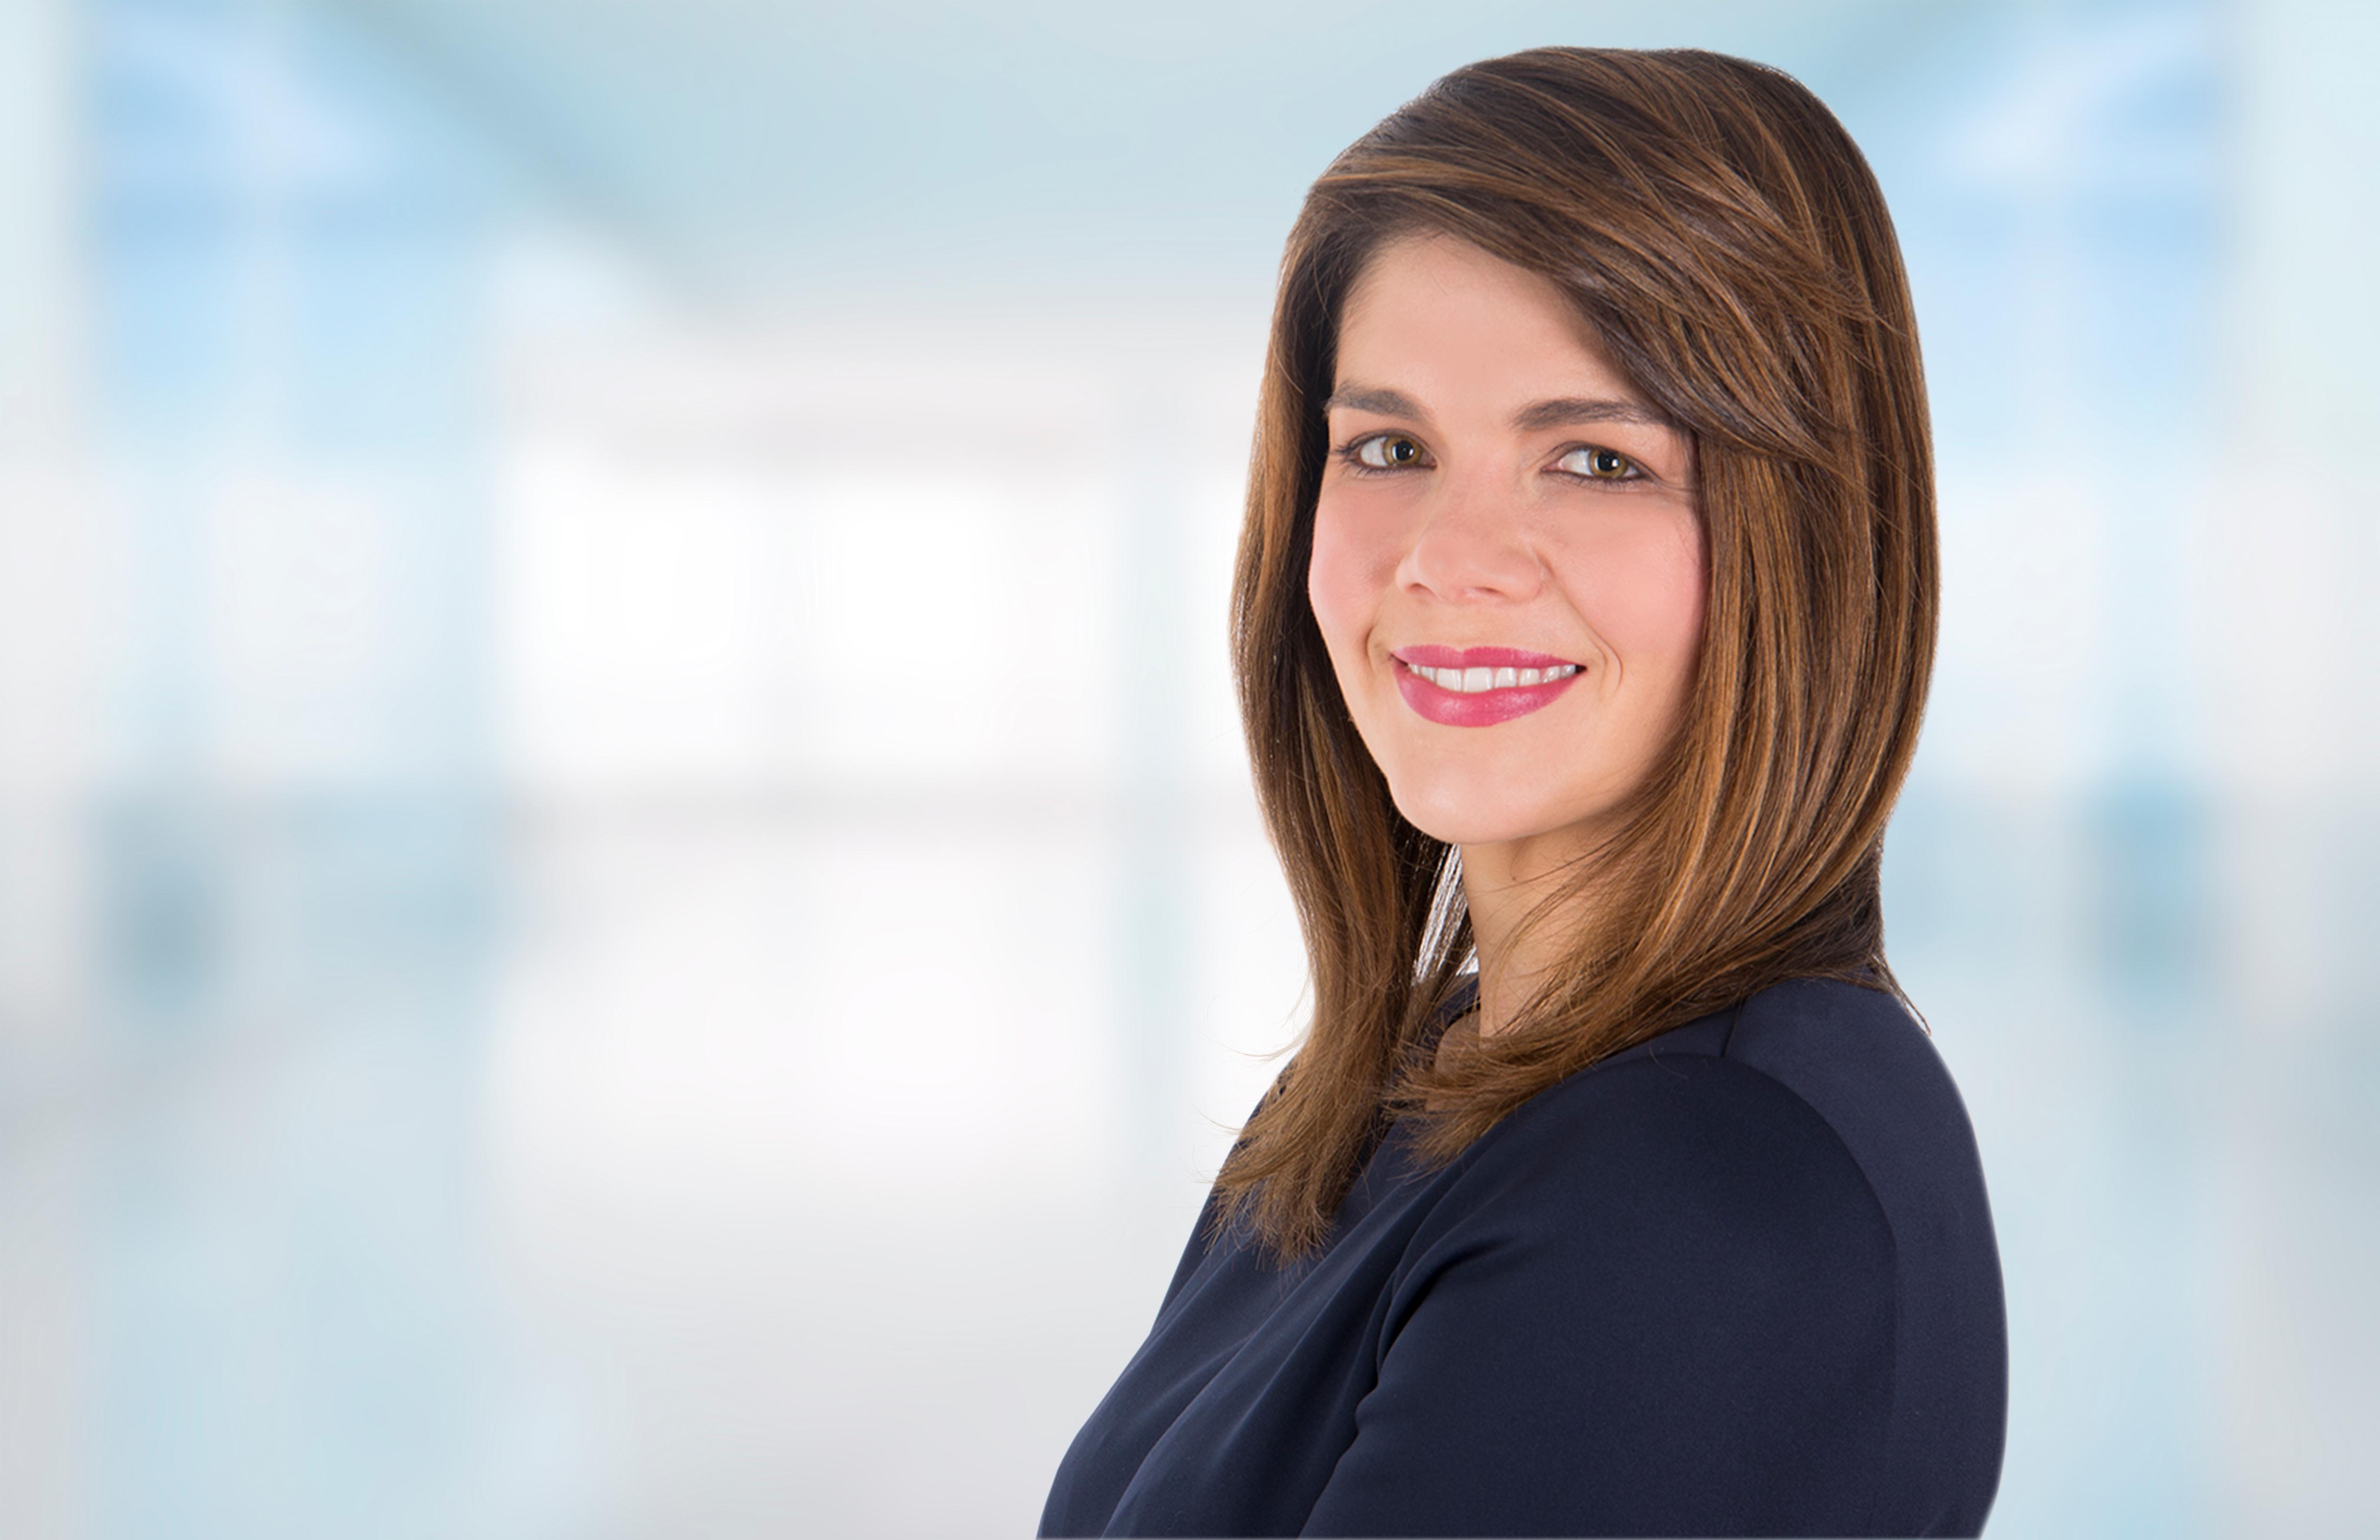 Andrea Dantas - Physician Executive at Cerner UK